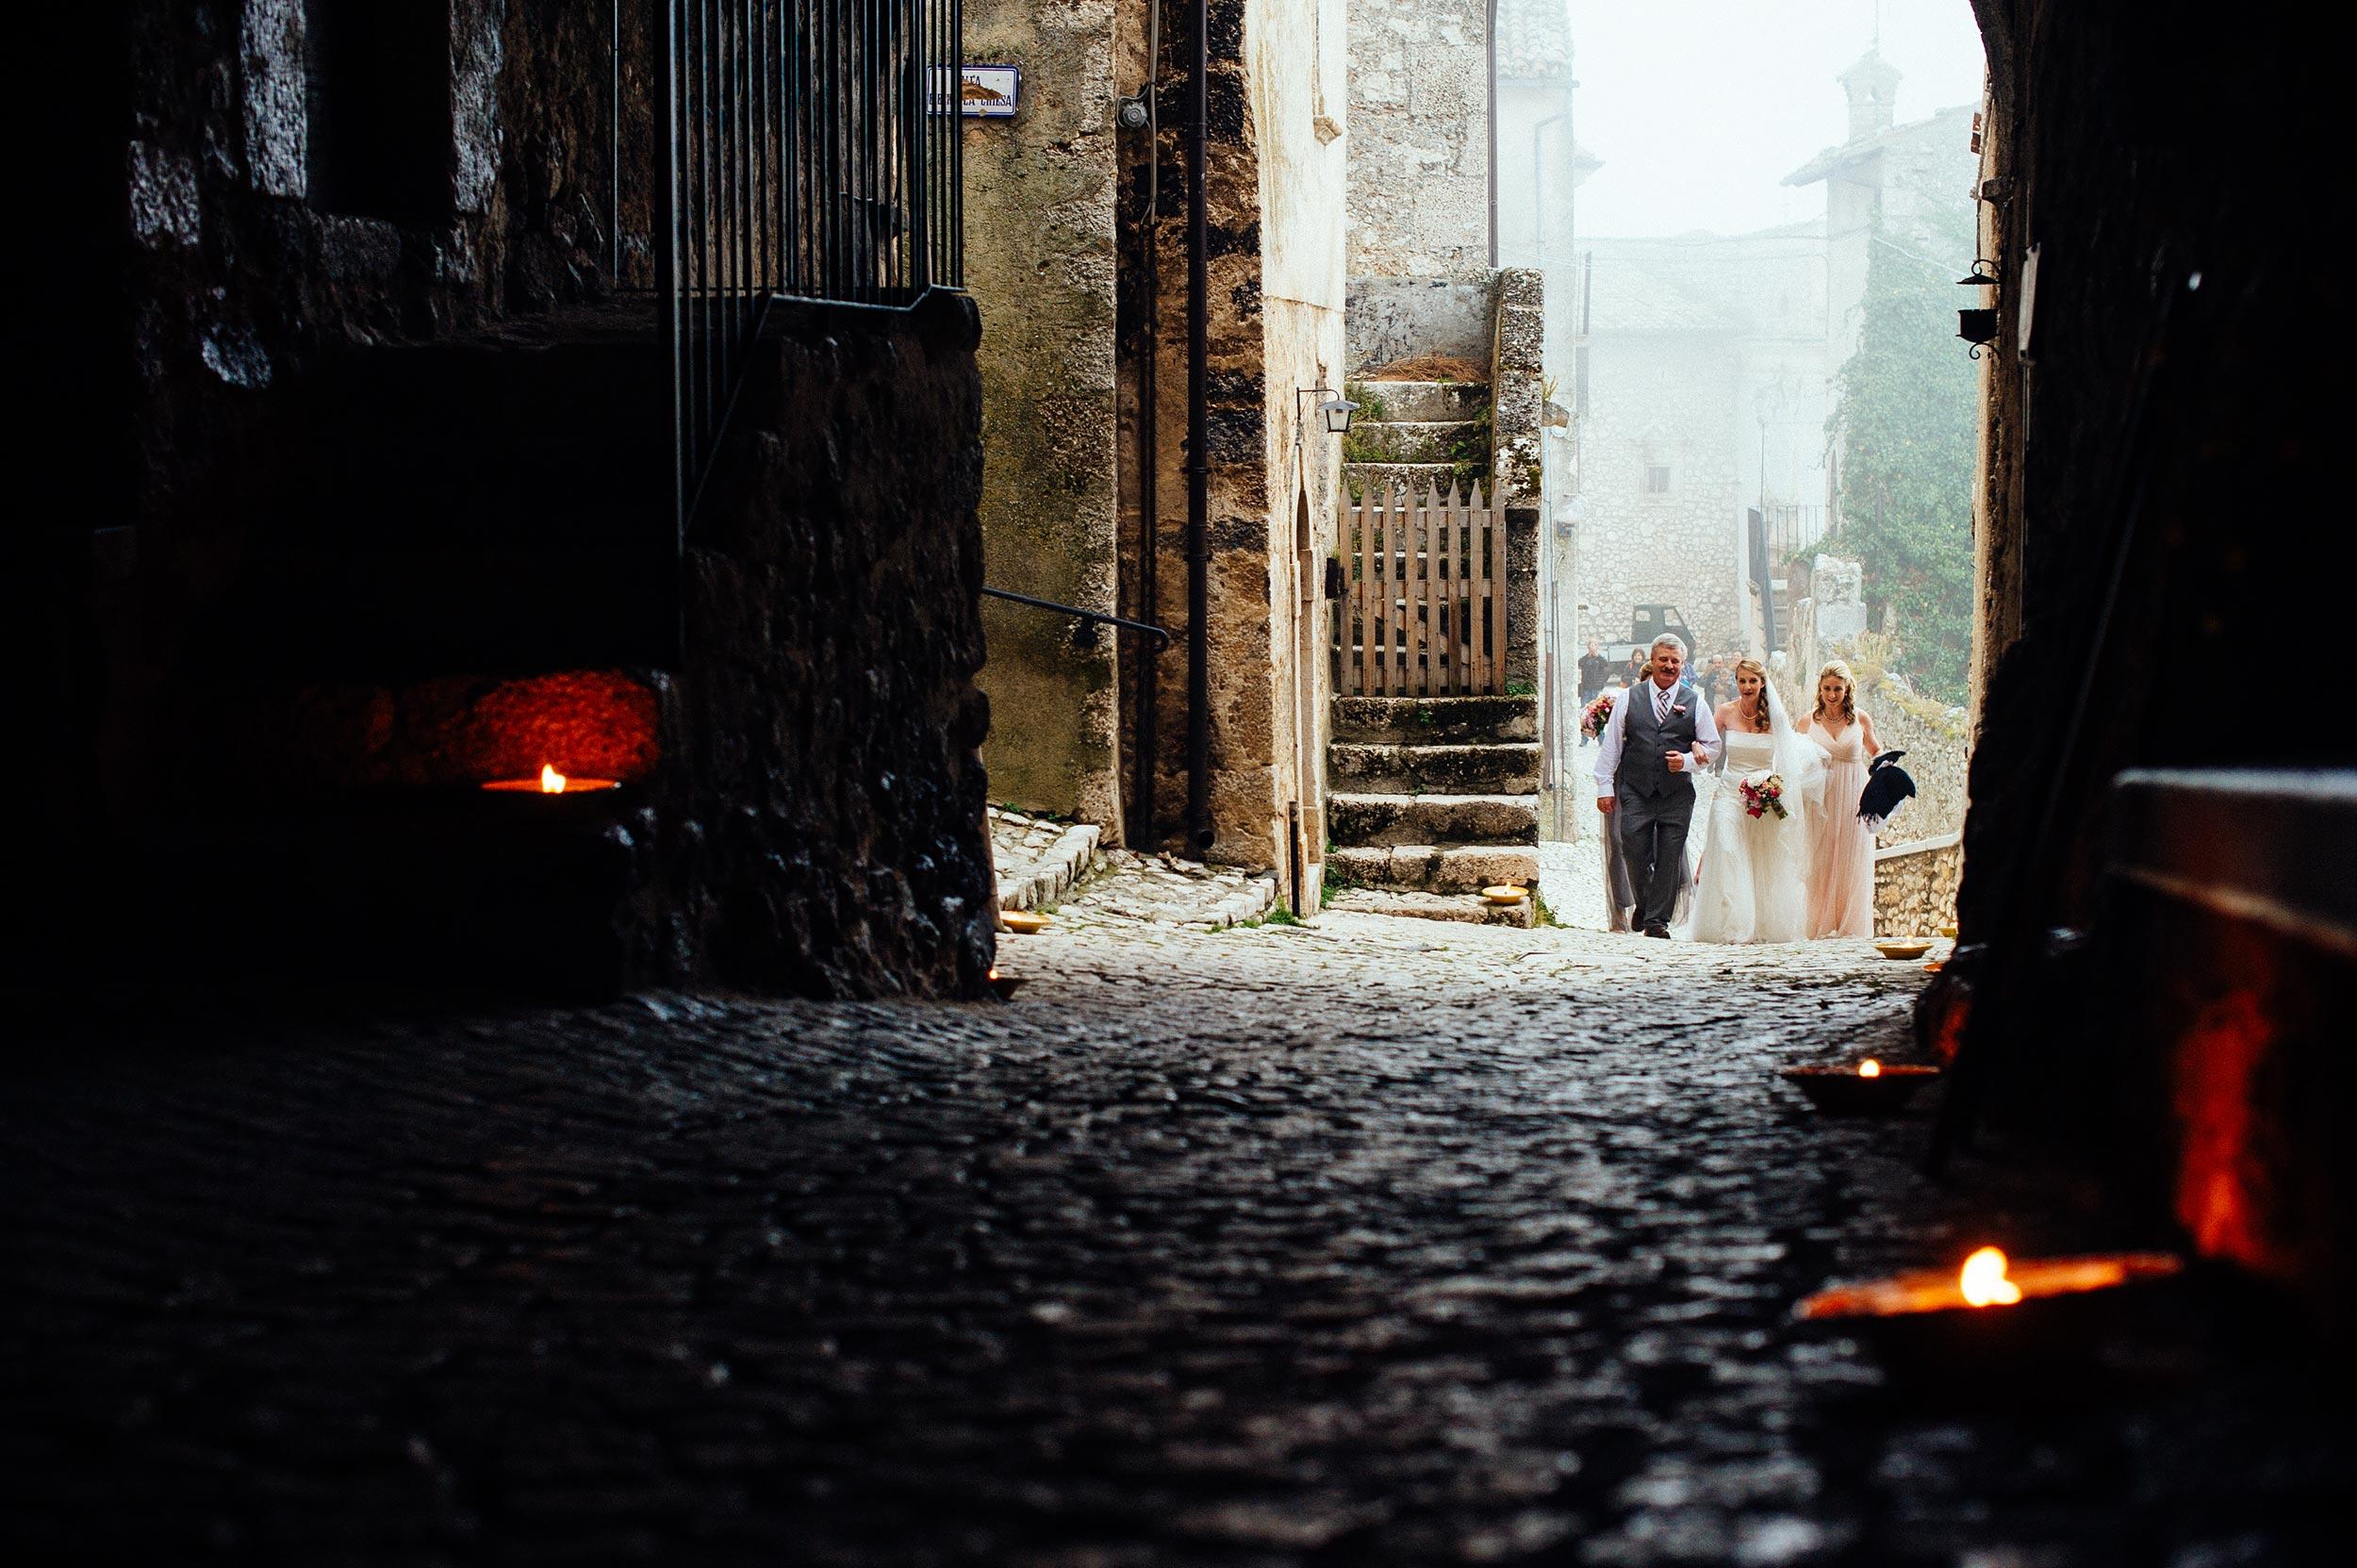 2014-Shelby-Jocelyn-Santo-Stefano-Di-Sessanio-Wedding-Photographer-Italy-Alessandro-Avenali-27.jpg